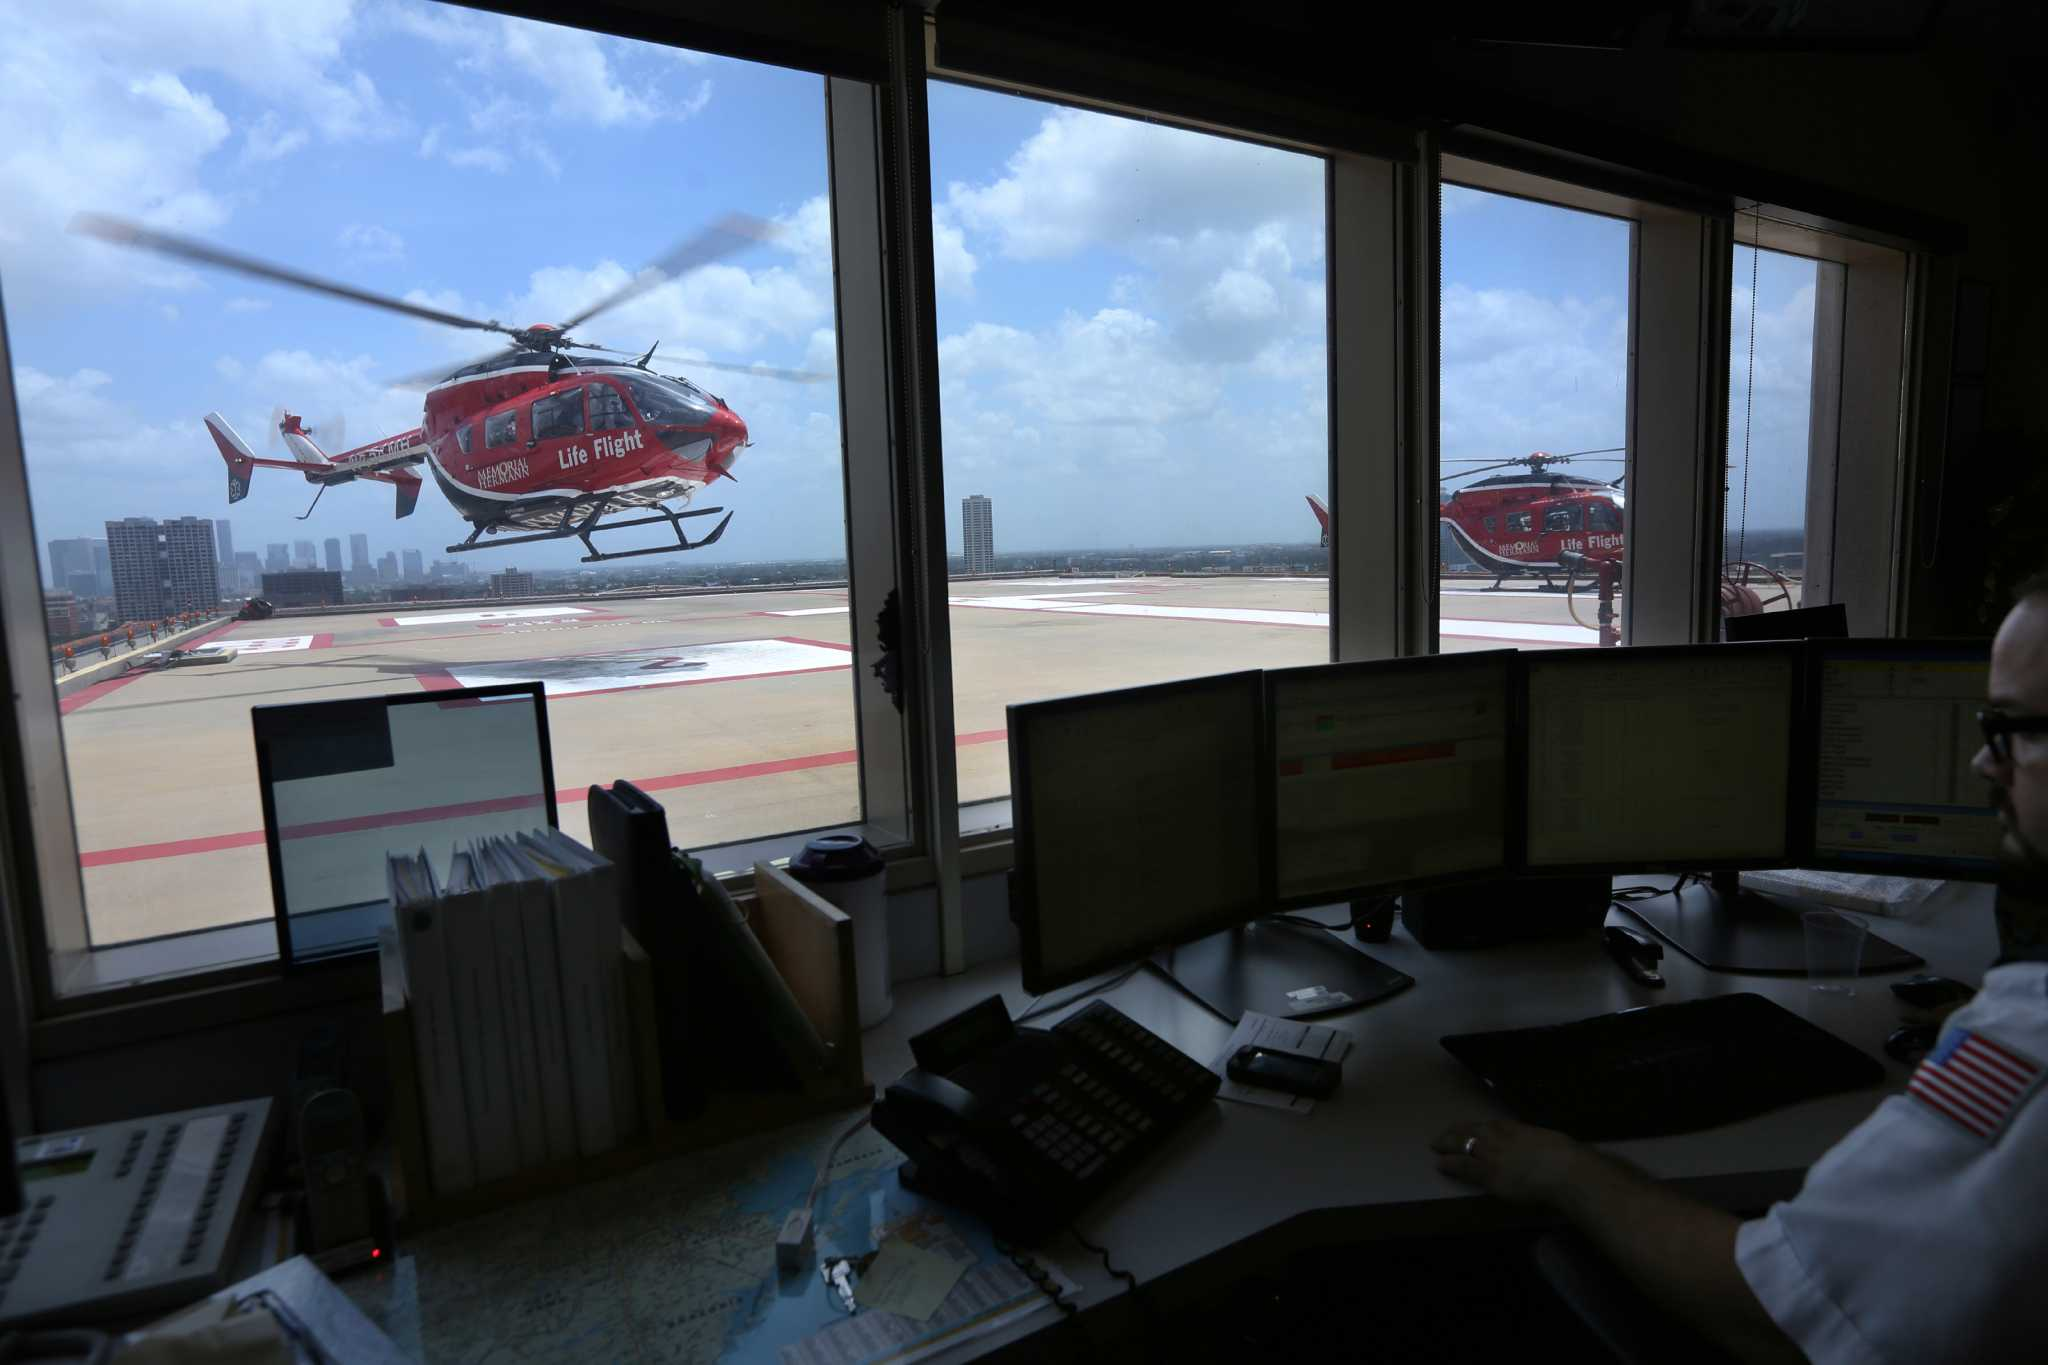 Houston area getting four high-level trauma centers